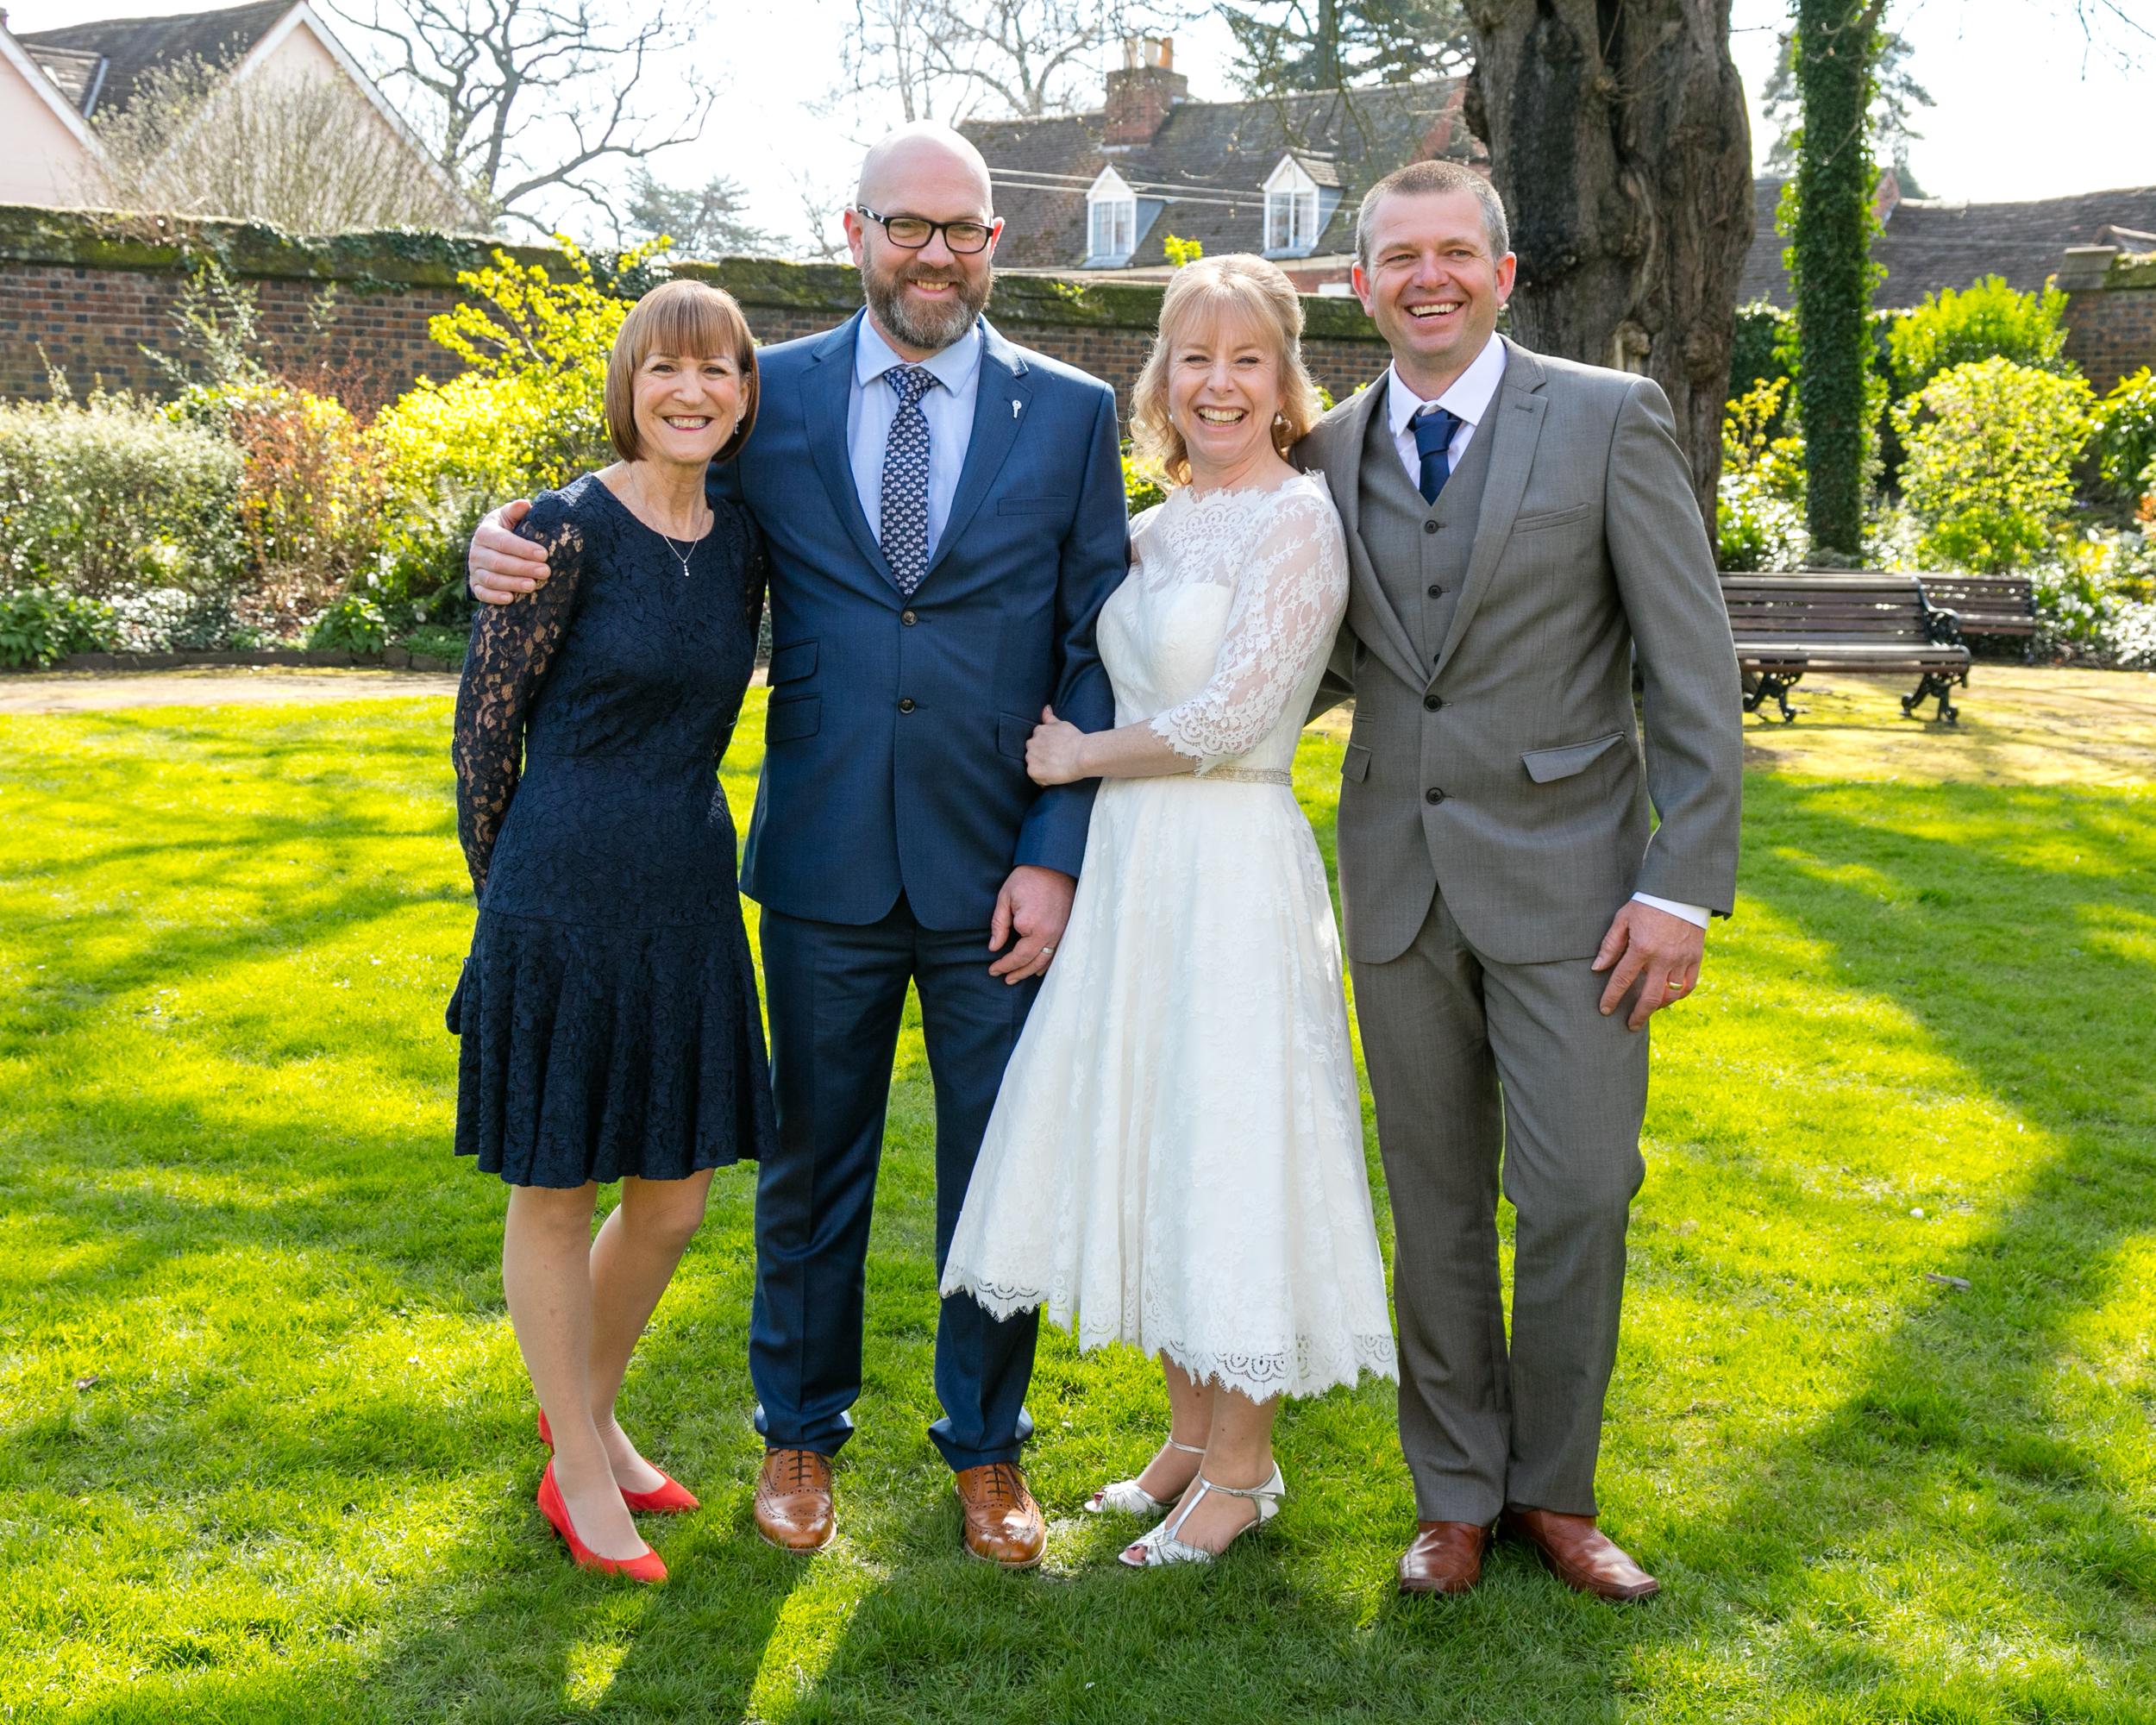 wedding-photography-at-Hill-Close-Gardens-Warwick61.jpg